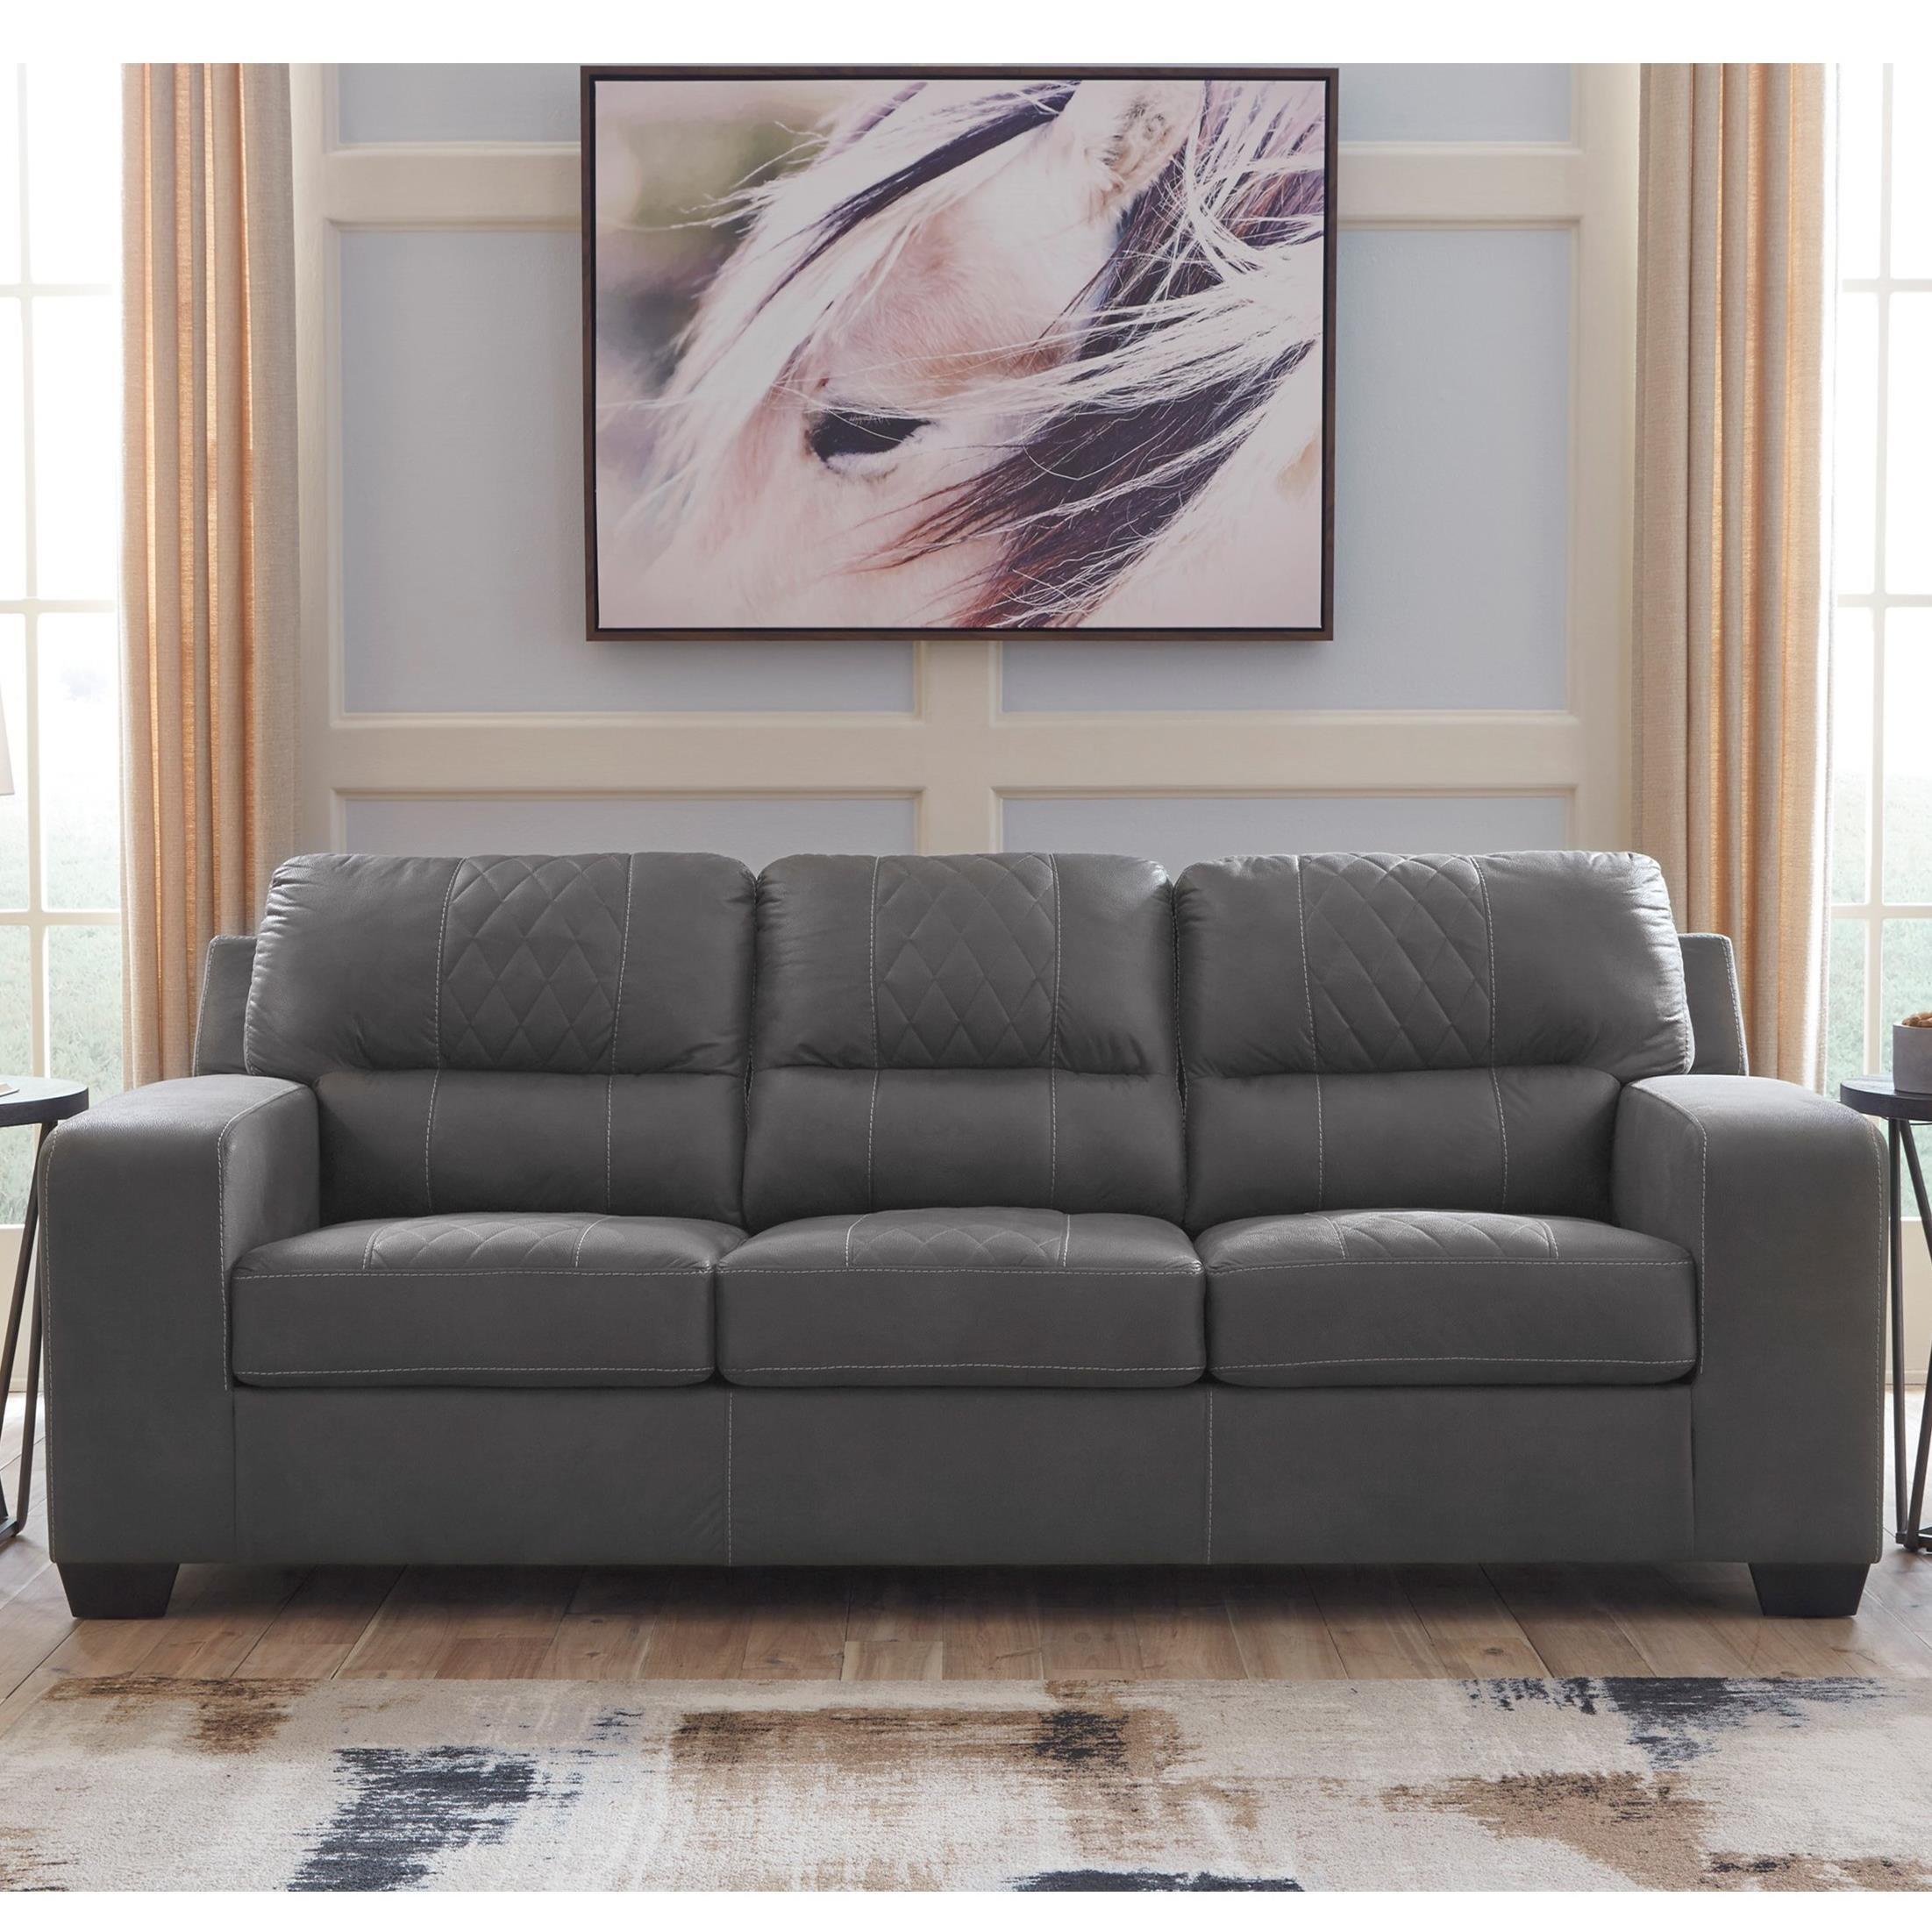 Benchcraft Narzole 7440138 Contemporary Sofa Sam Levitz